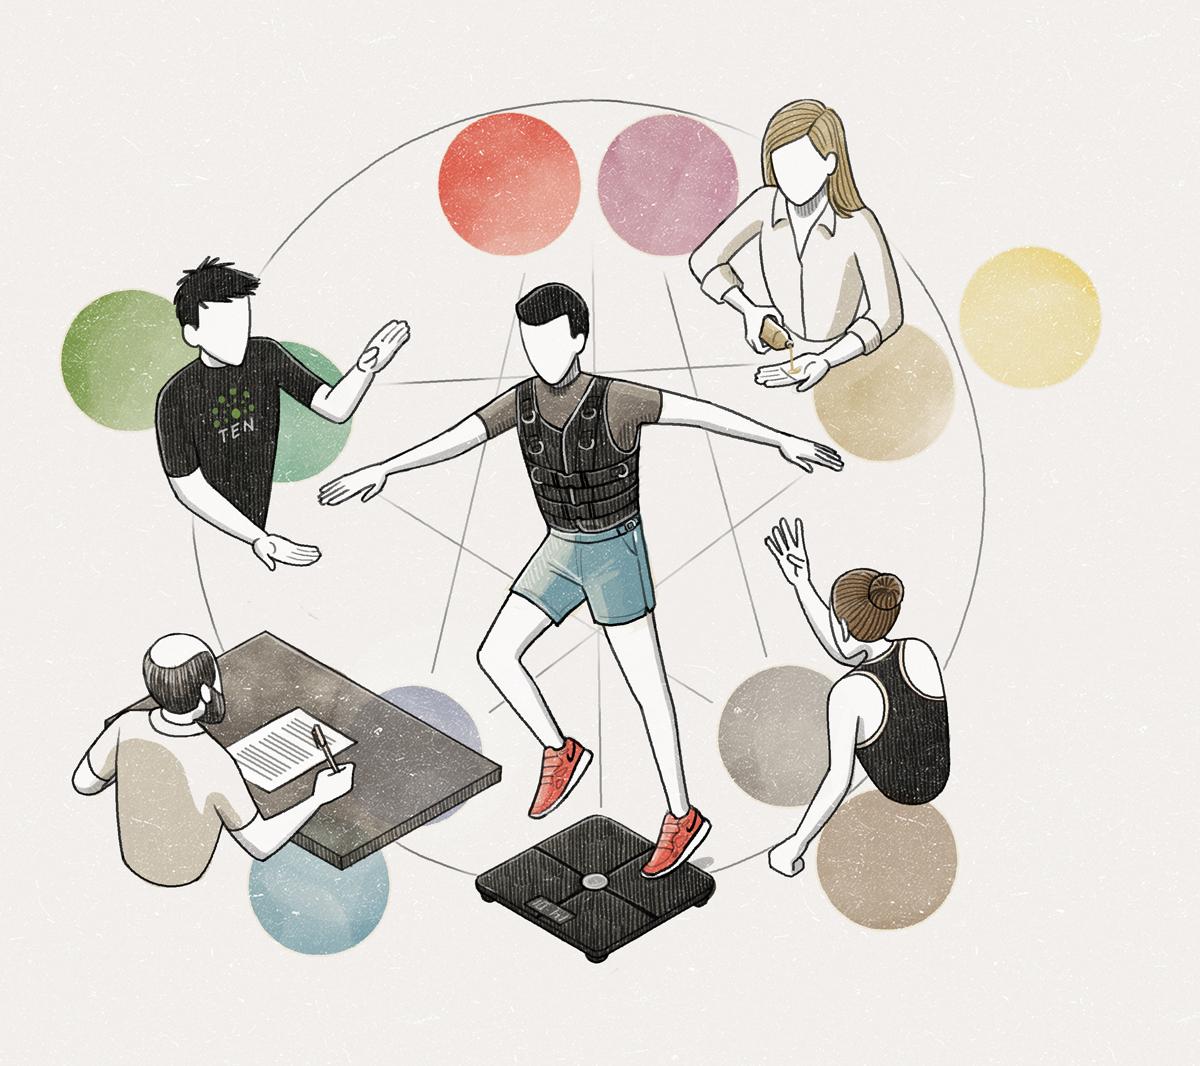 Vinson View Illustration for Wallpaper* june 2015 by Danae Diaz